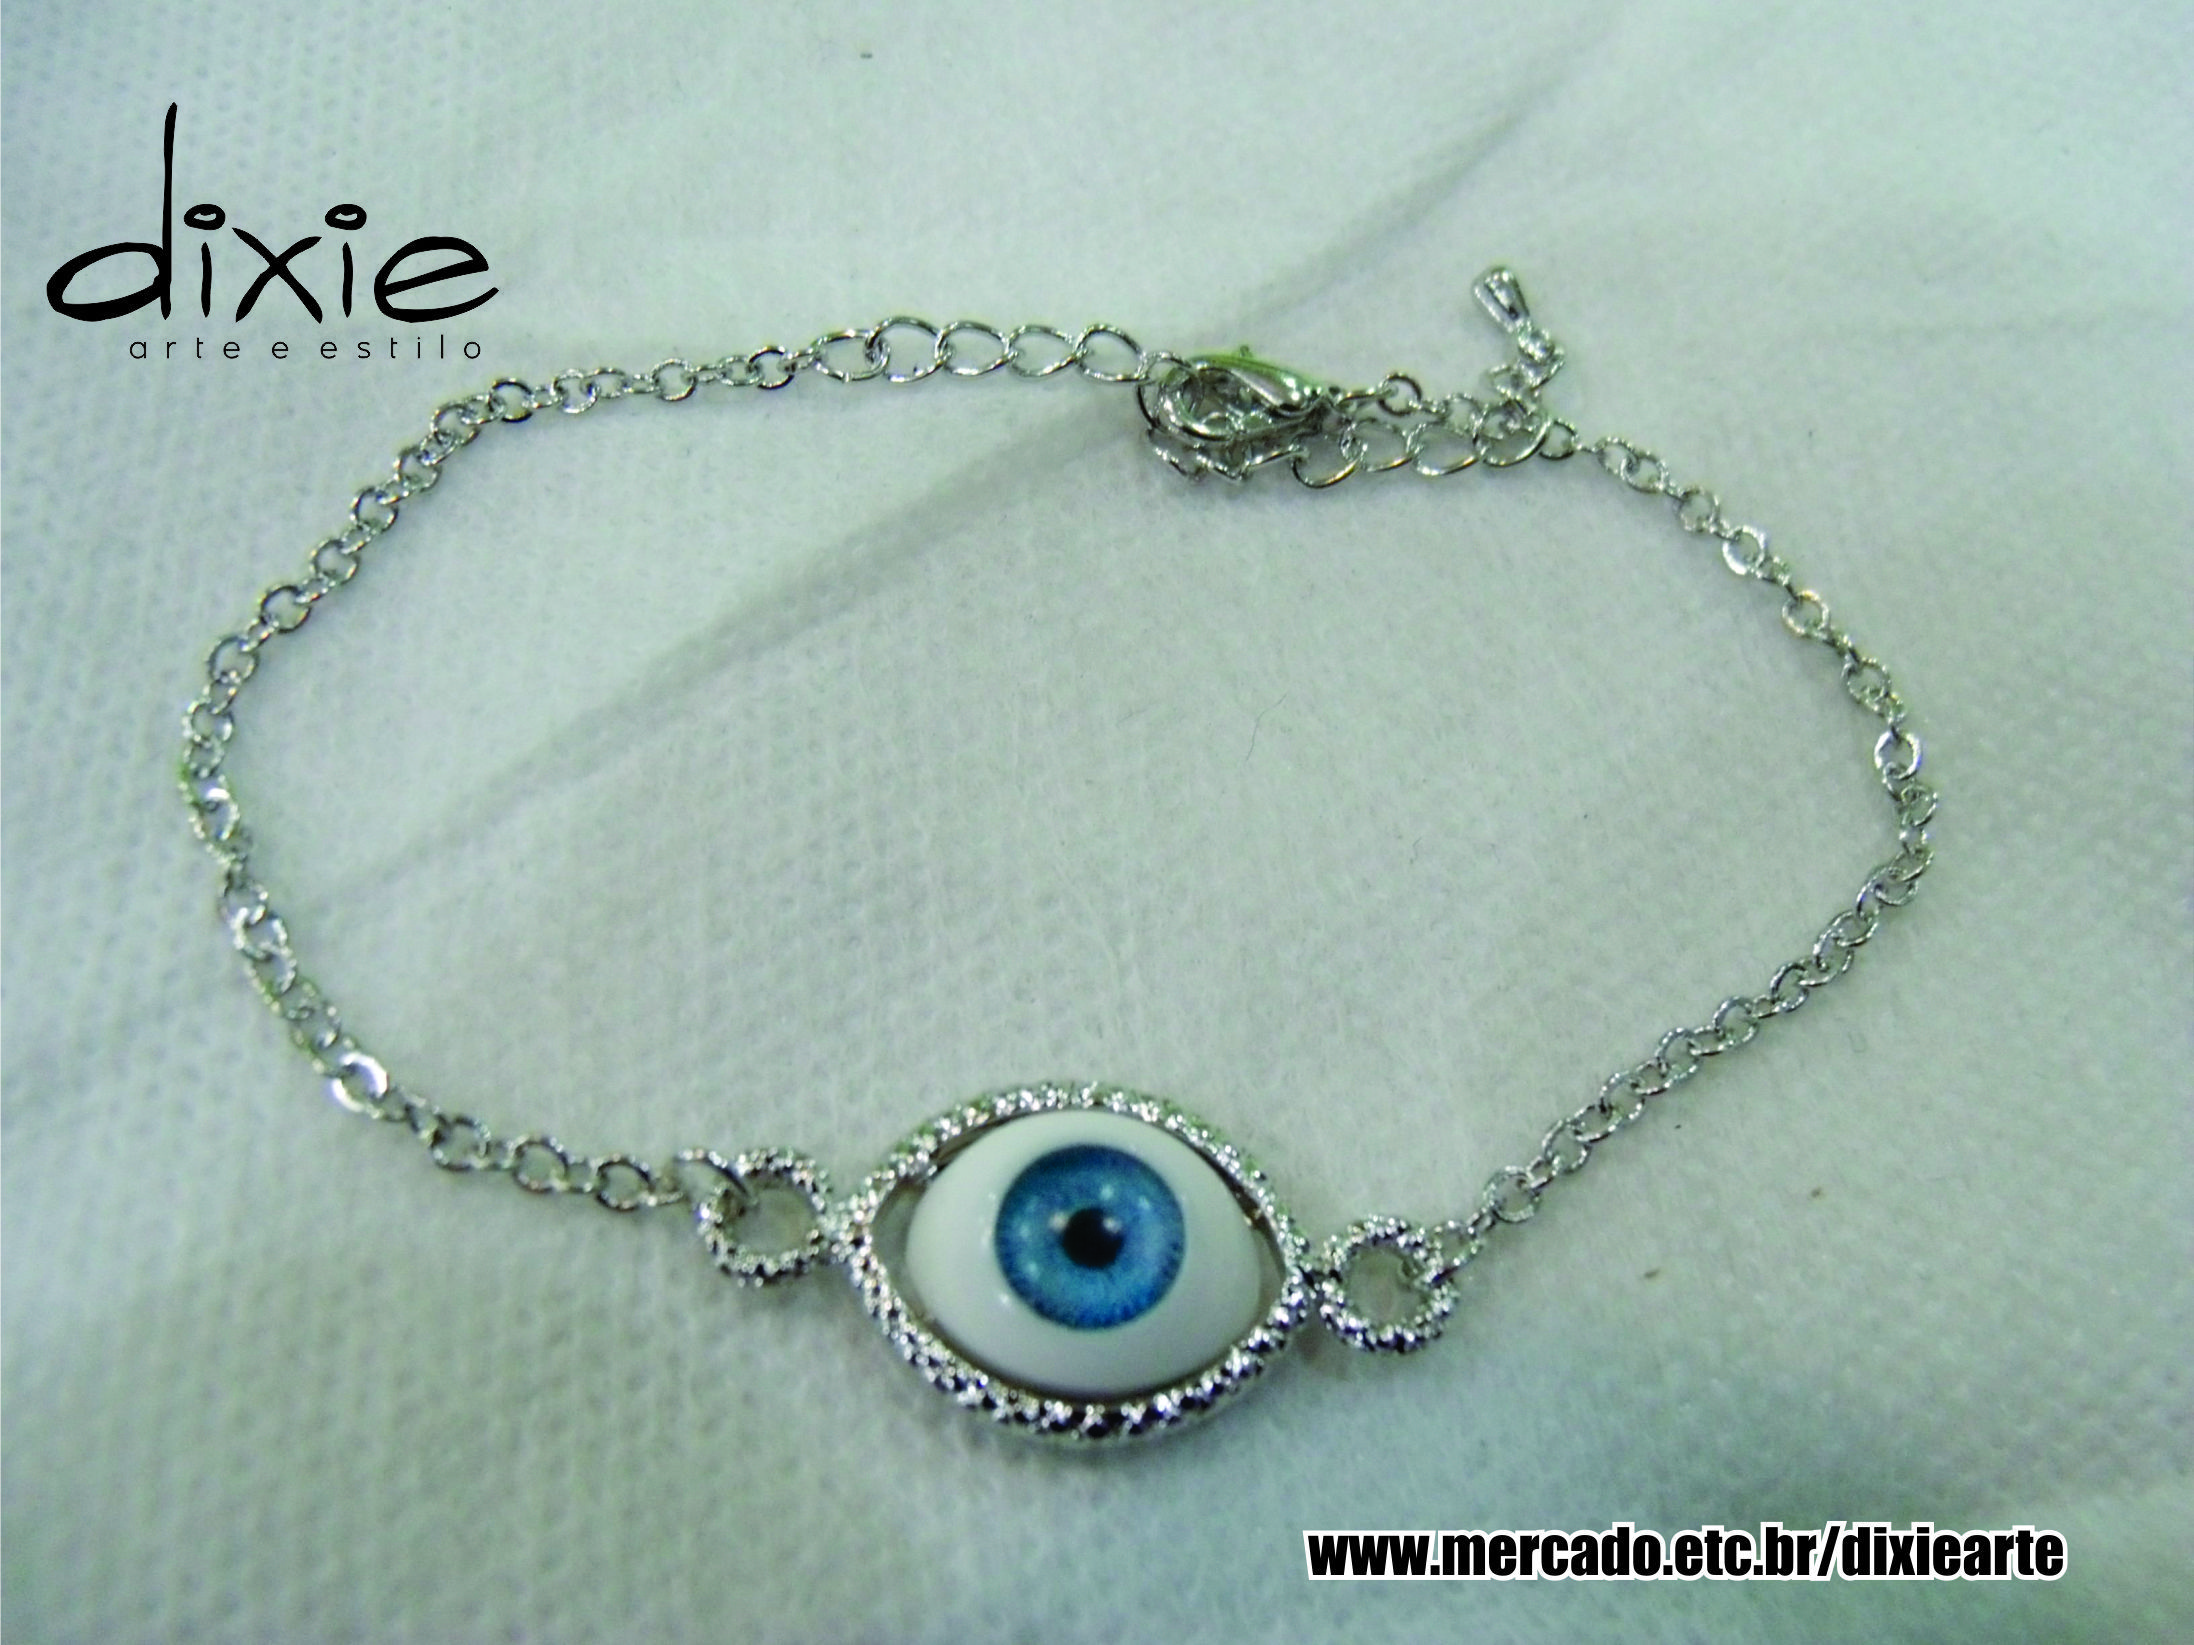 Pulseira Olho Grego  www.mercado.etc.br/dixiearte